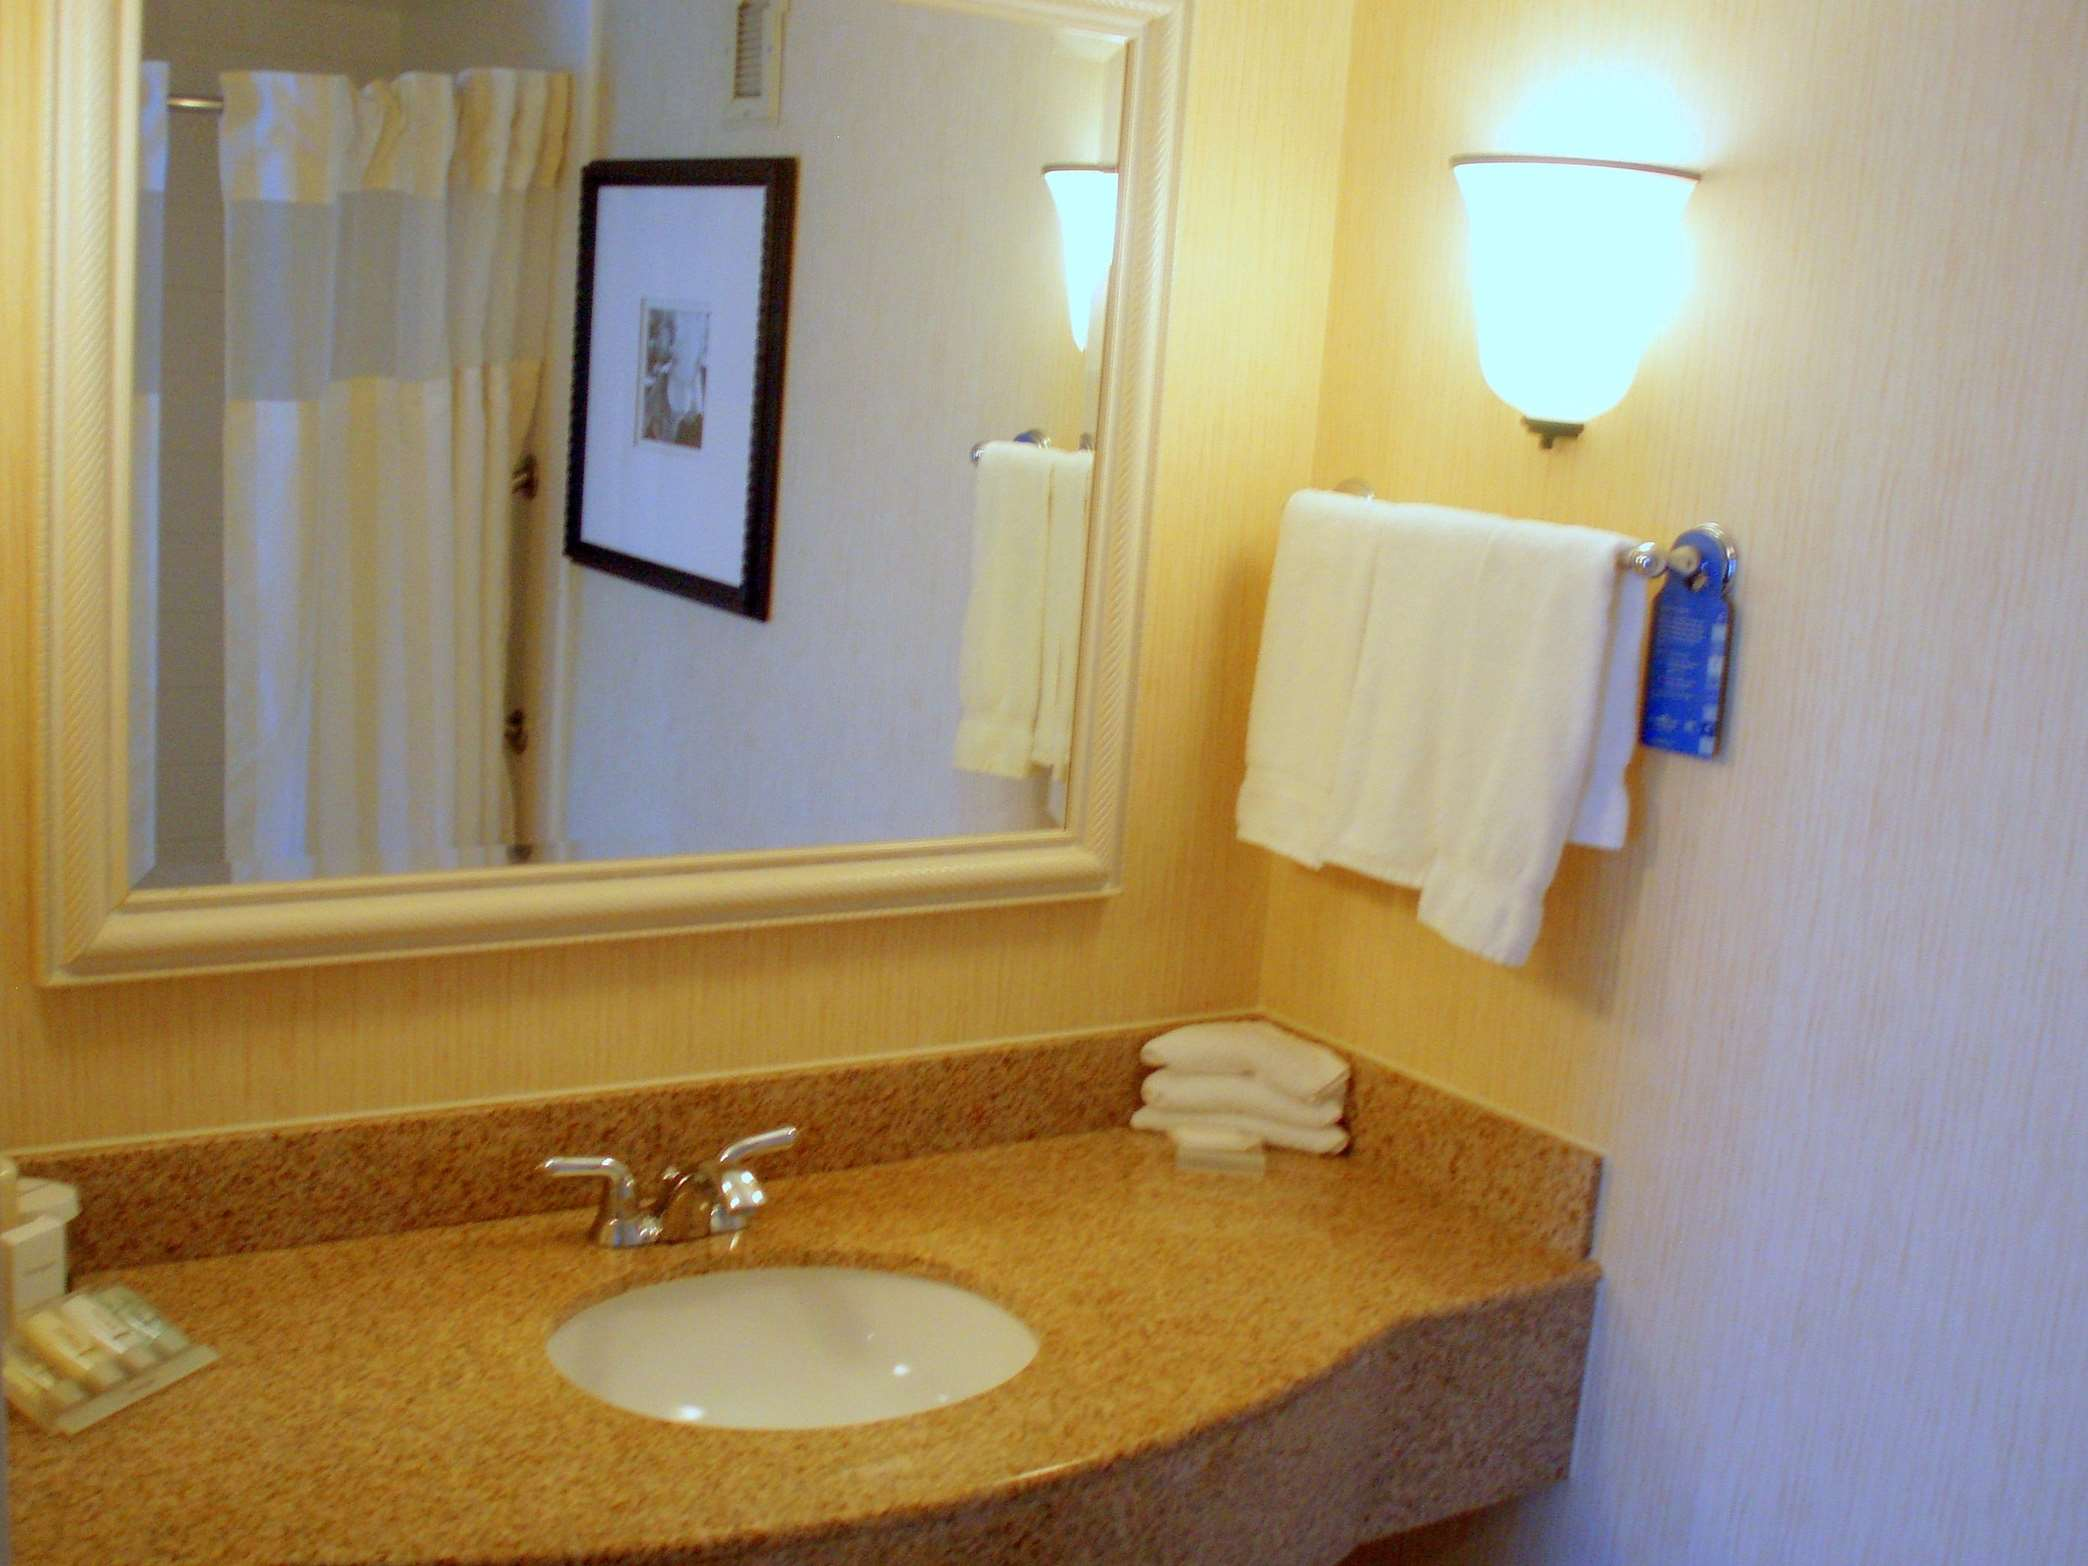 Hilton Garden Inn Saratoga Springs 125 South Broadway Saratoga ...